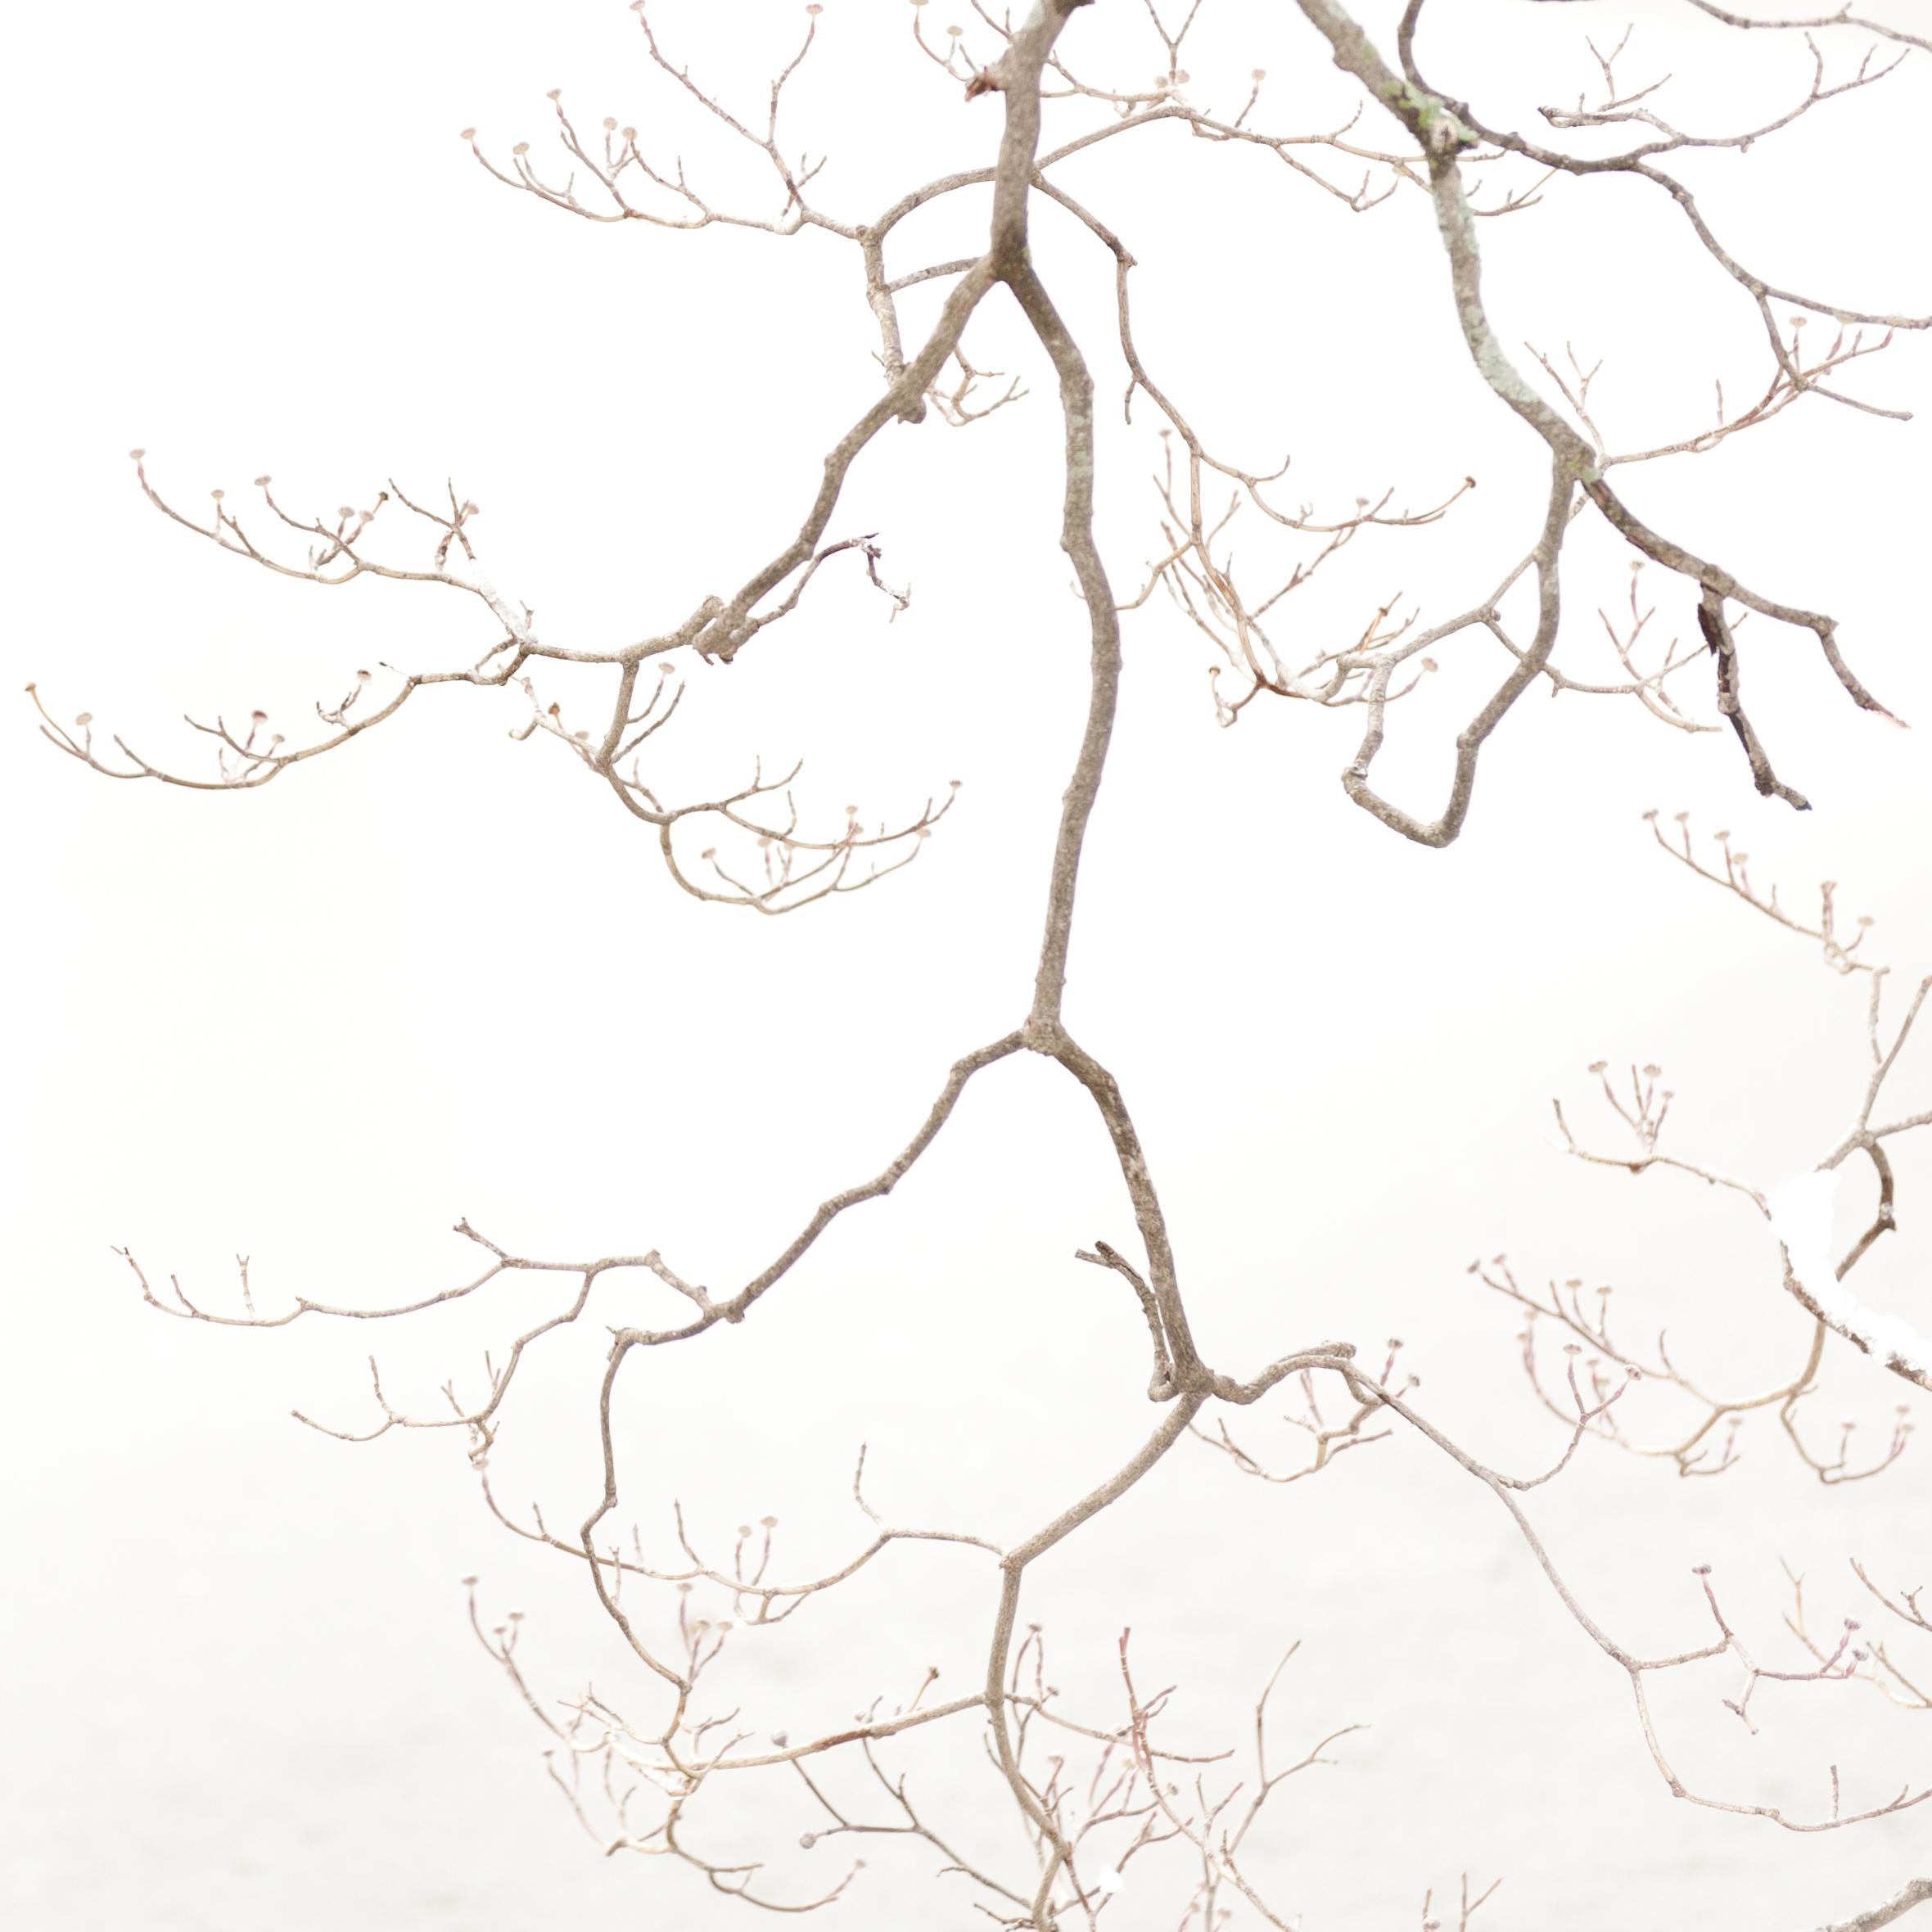 Study in Snow, Dogwood Tree, 8